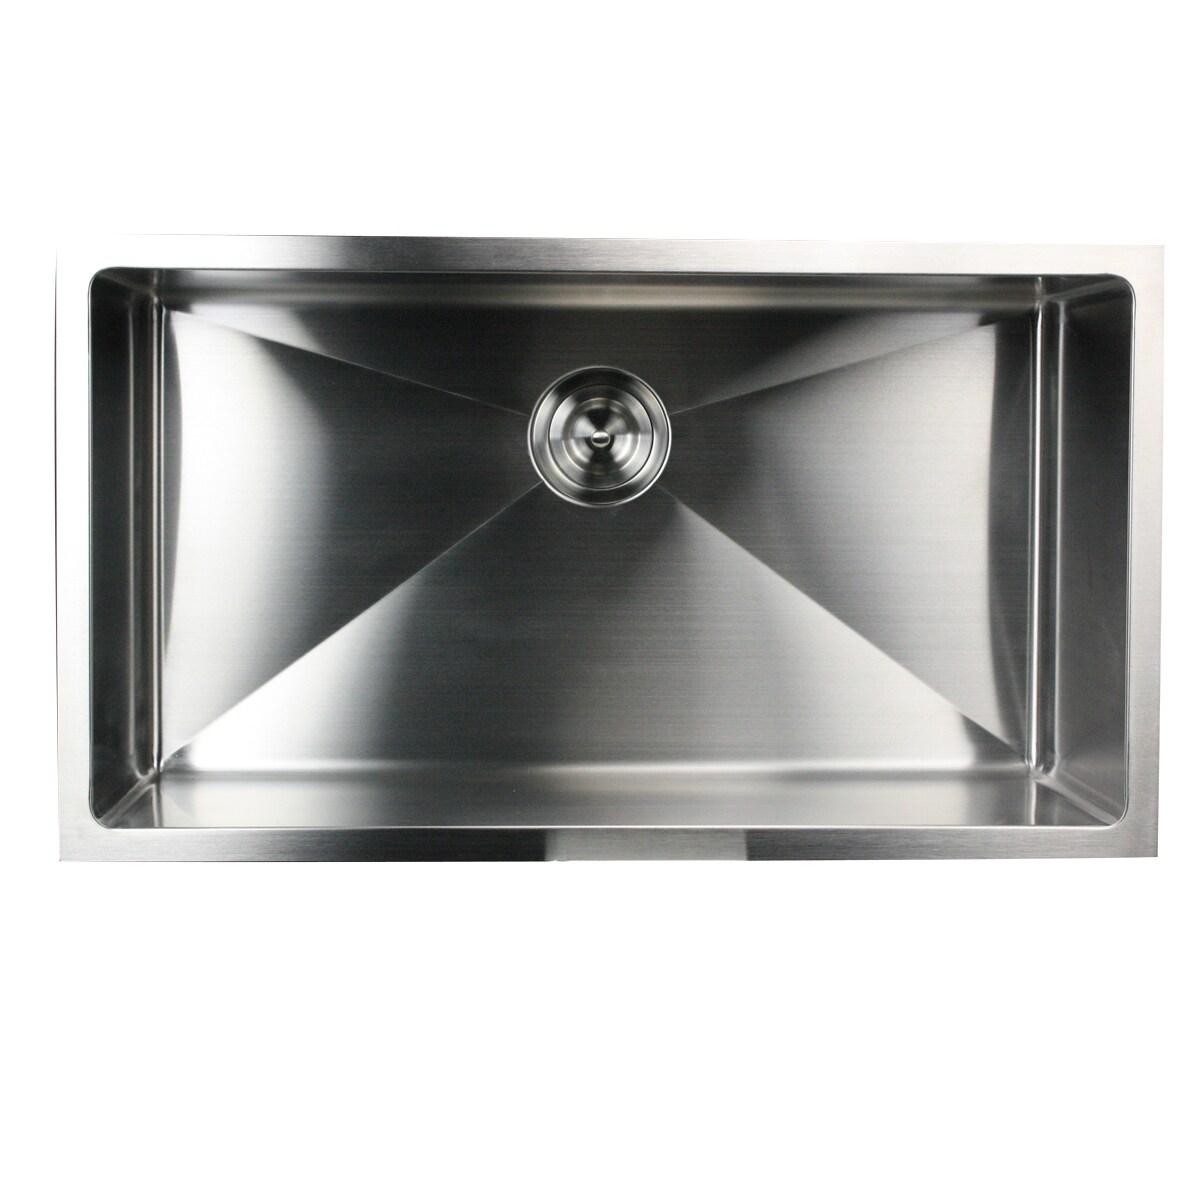 32 inch small radius undermount 16 gauge stainless steel kitchen sink with drain